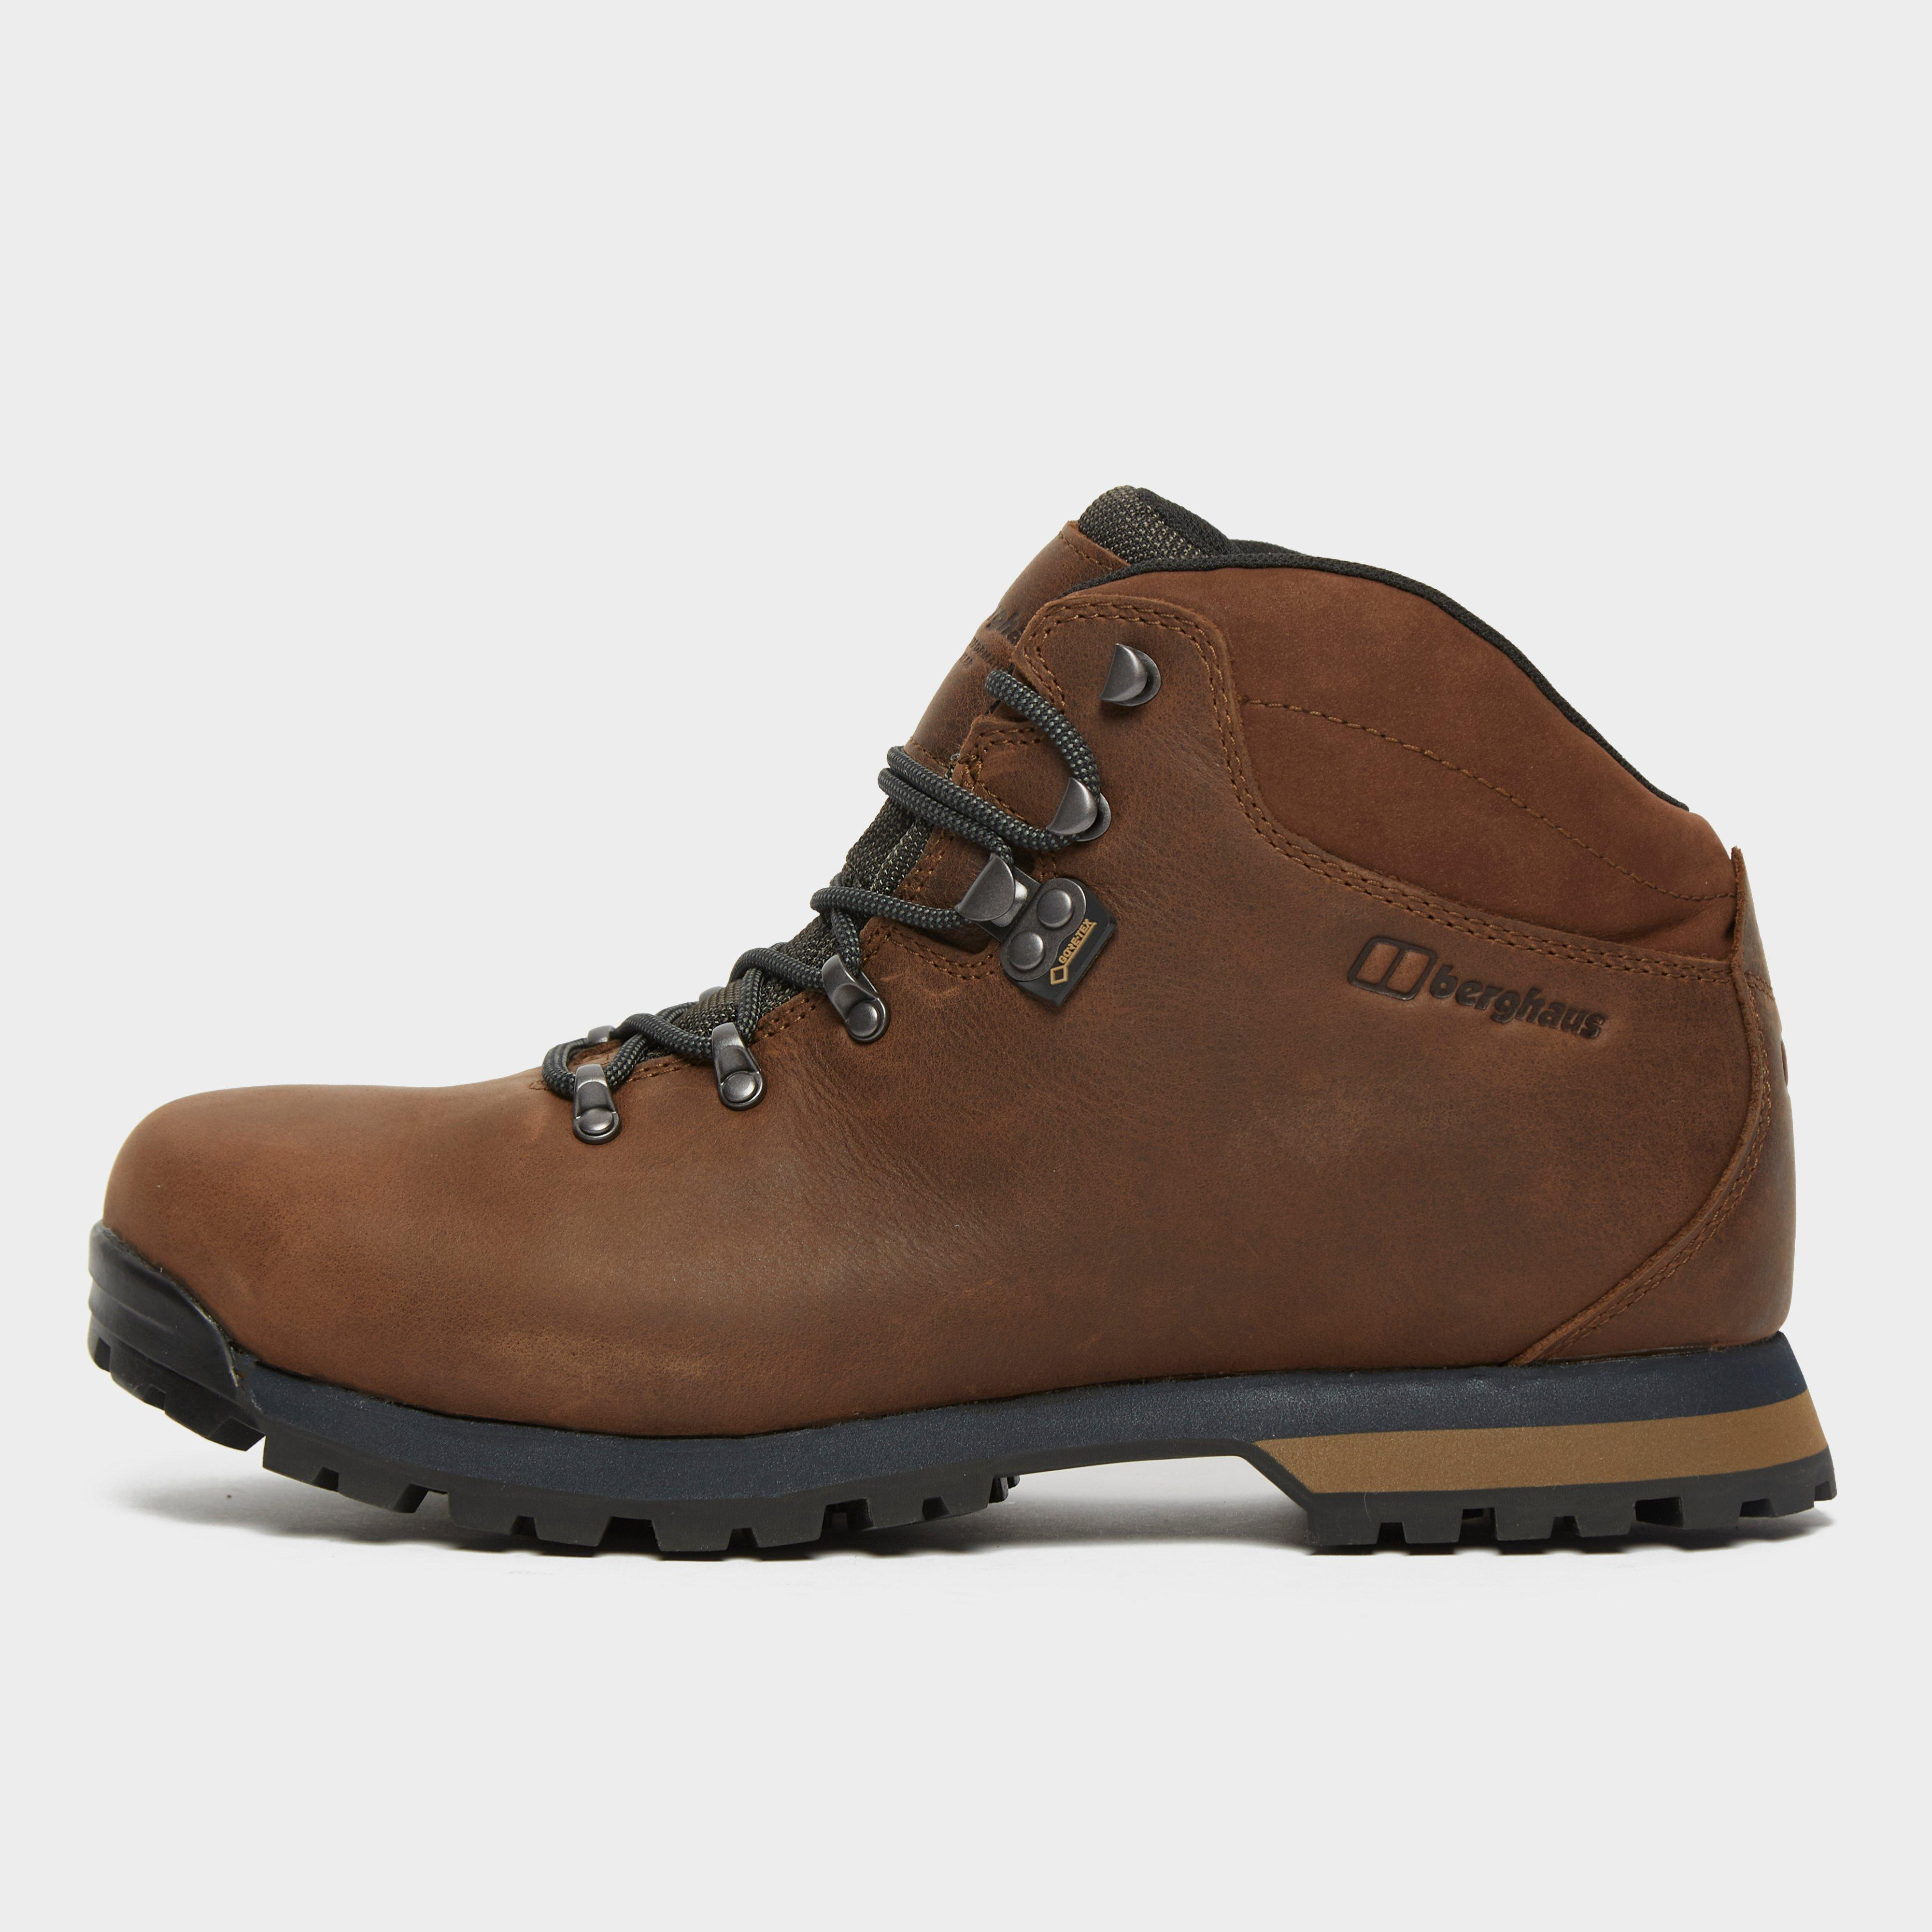 54de26512f6 Men's Hillwalker GORE-TEX® Walking Boot